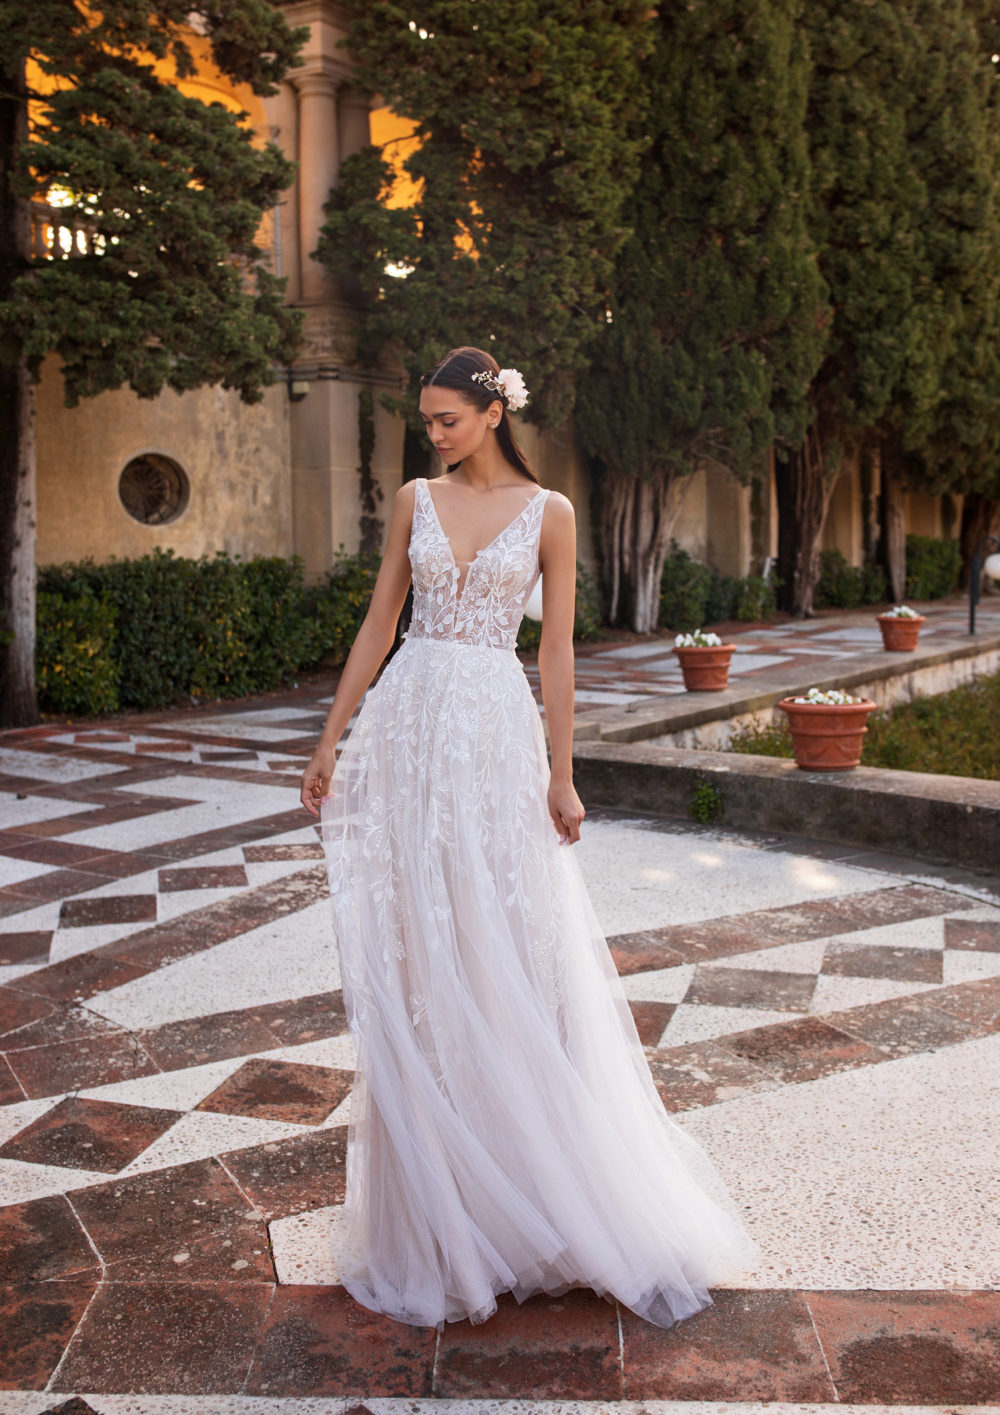 Mariages: abito da sposa Pronovias 2020 a Vicenza, Verona, Padova, Veneto ELARA